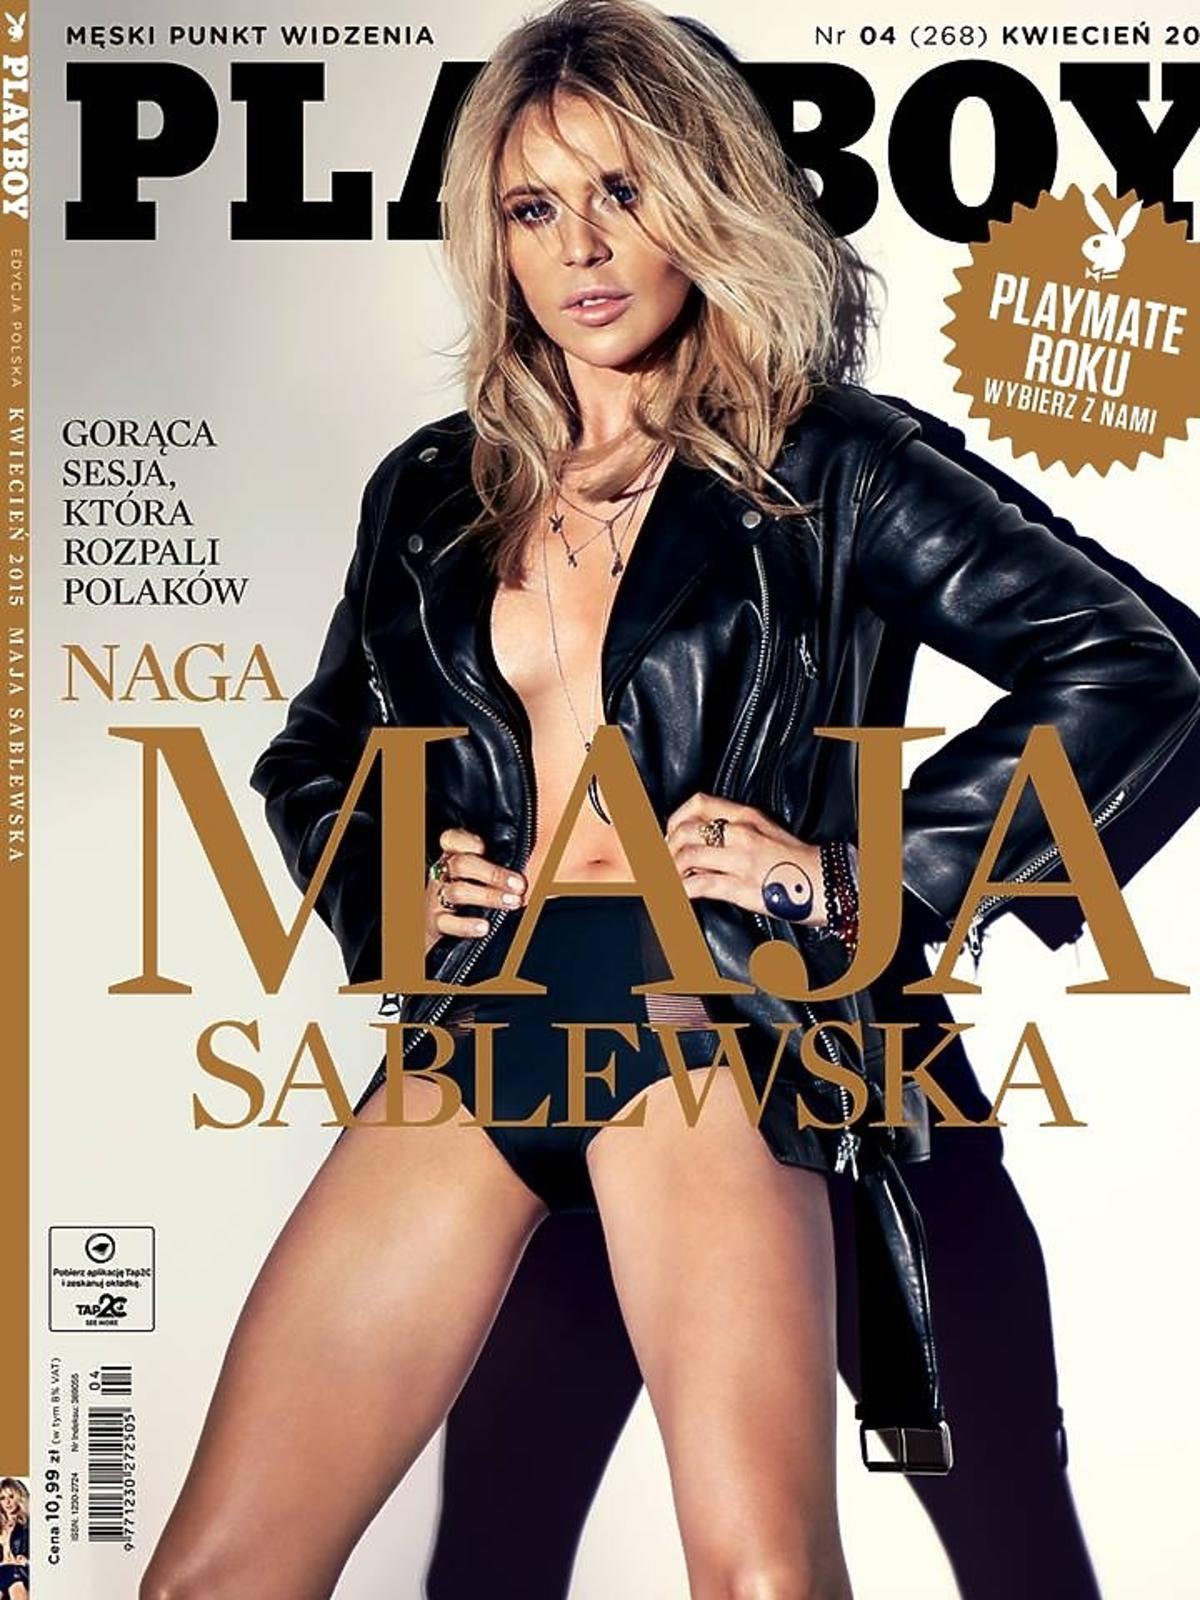 Maja Sablewska na okładce Playboya